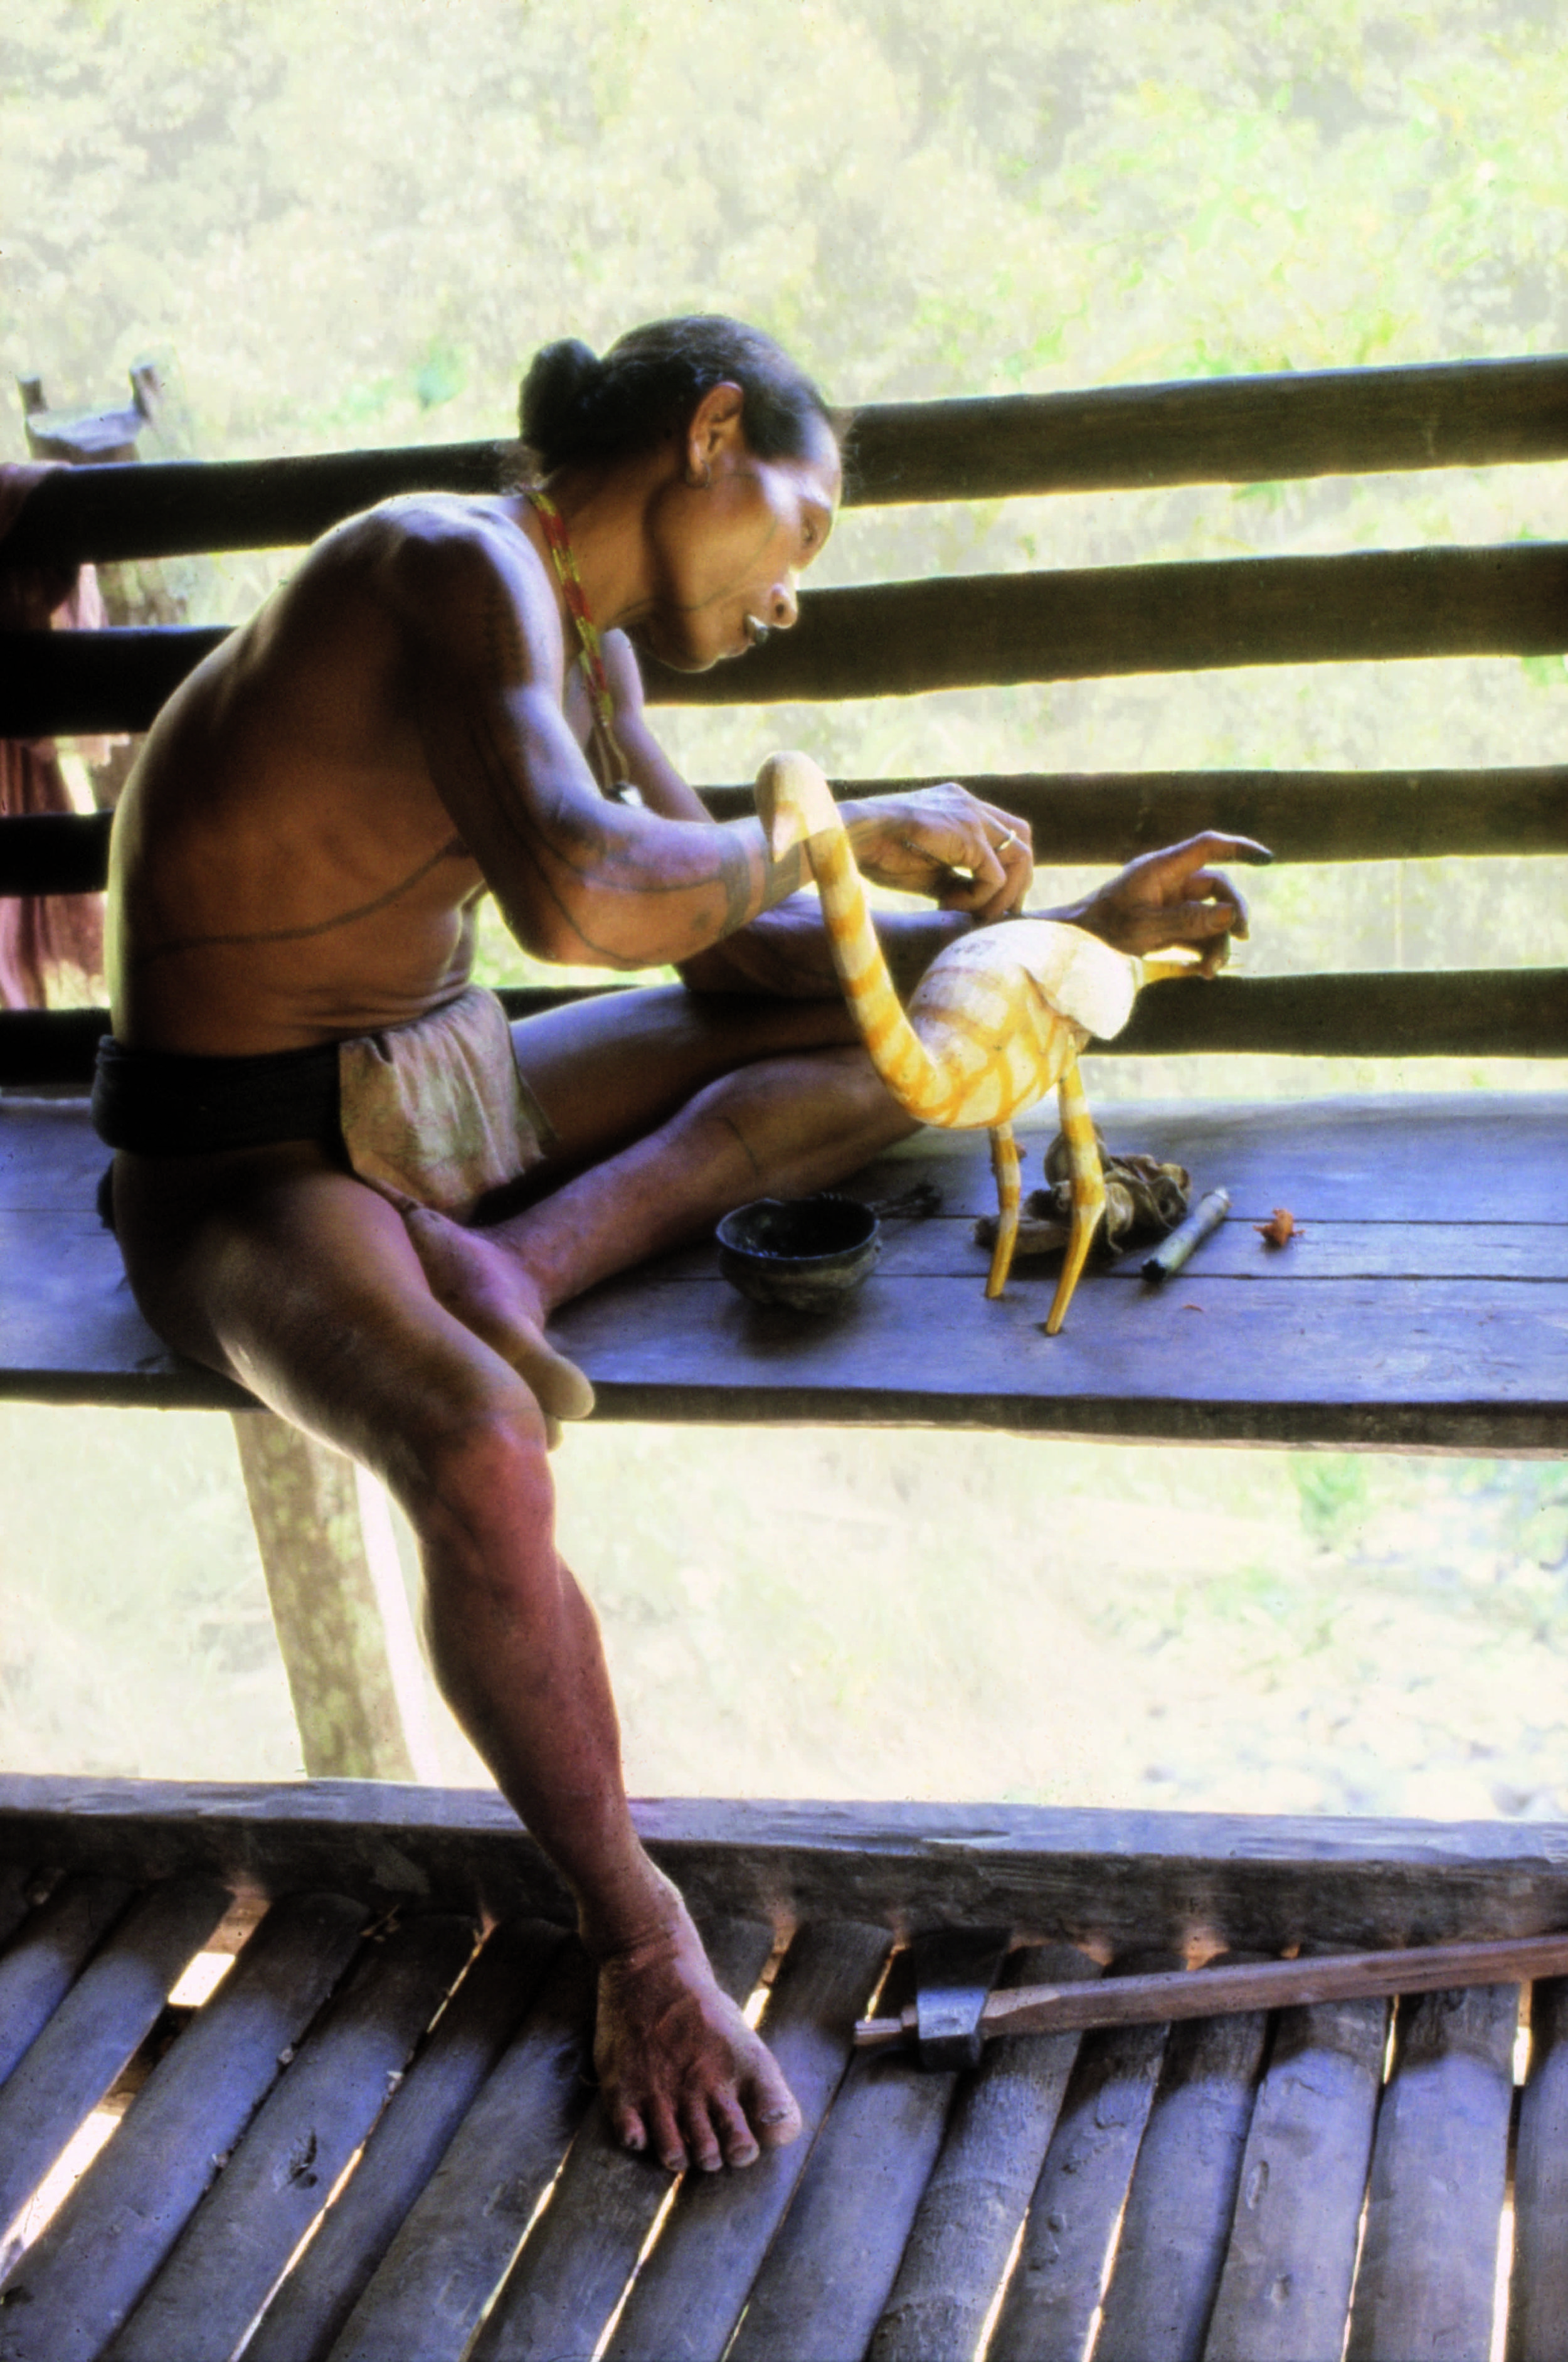 Art of the Ancestors Dr. Reimar Schefold Steven G. Alpert Asian Art Island Southeast Asian Art Oceanic Art Asiatica Ethnographica Art Collection Fine Art Primitive Art Indonesian Art Tribal Art Eyes of the Ancestors